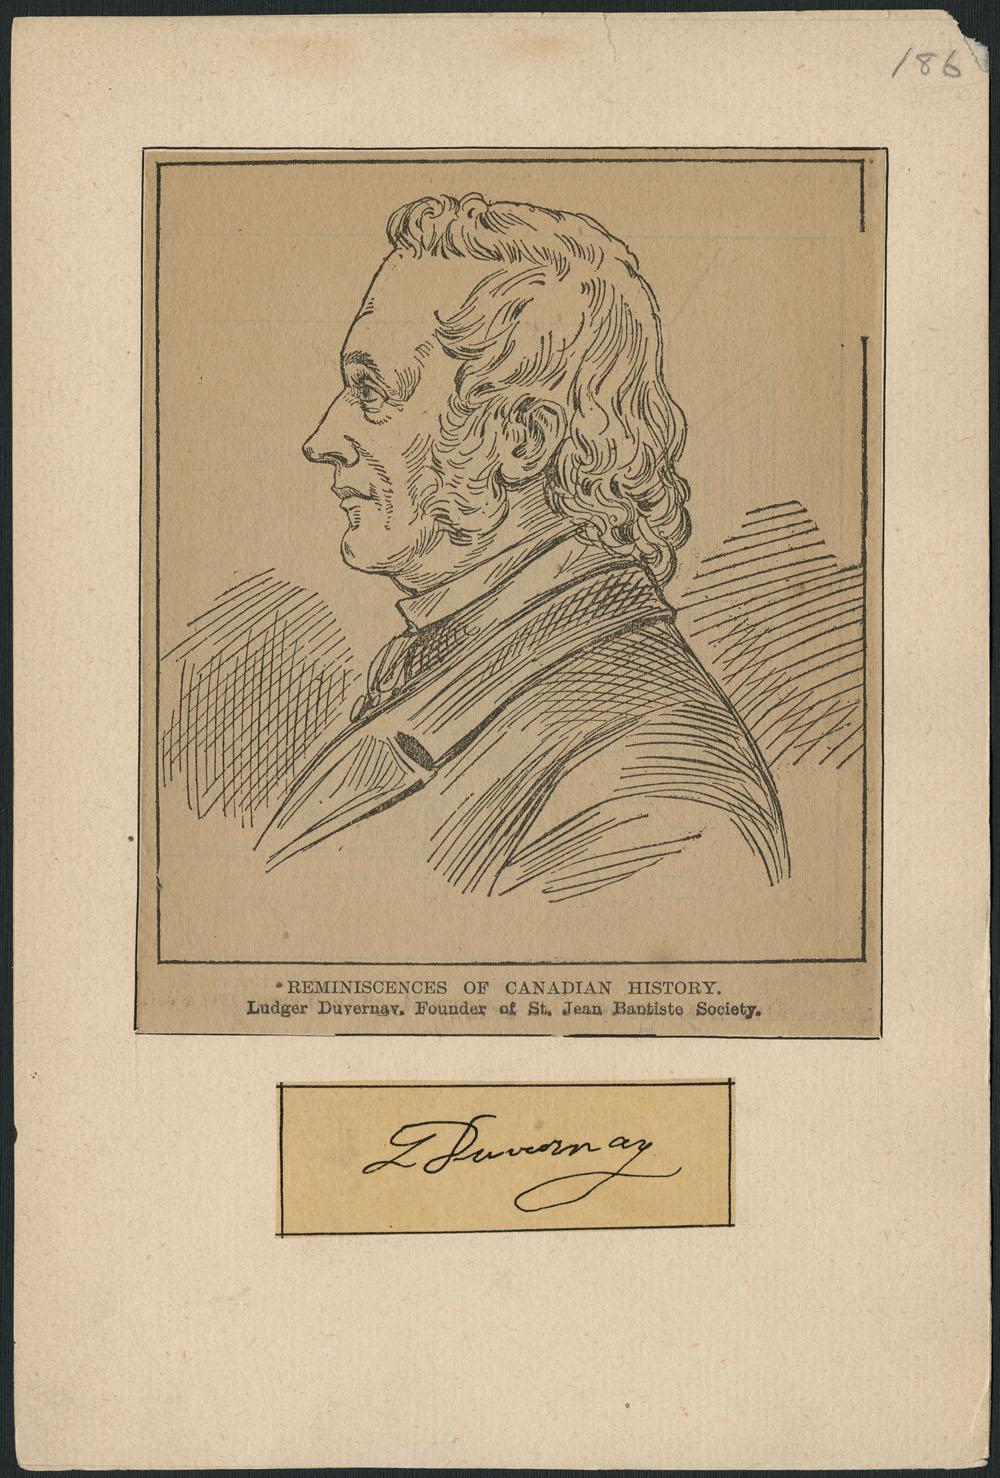 Ludger Duvernay